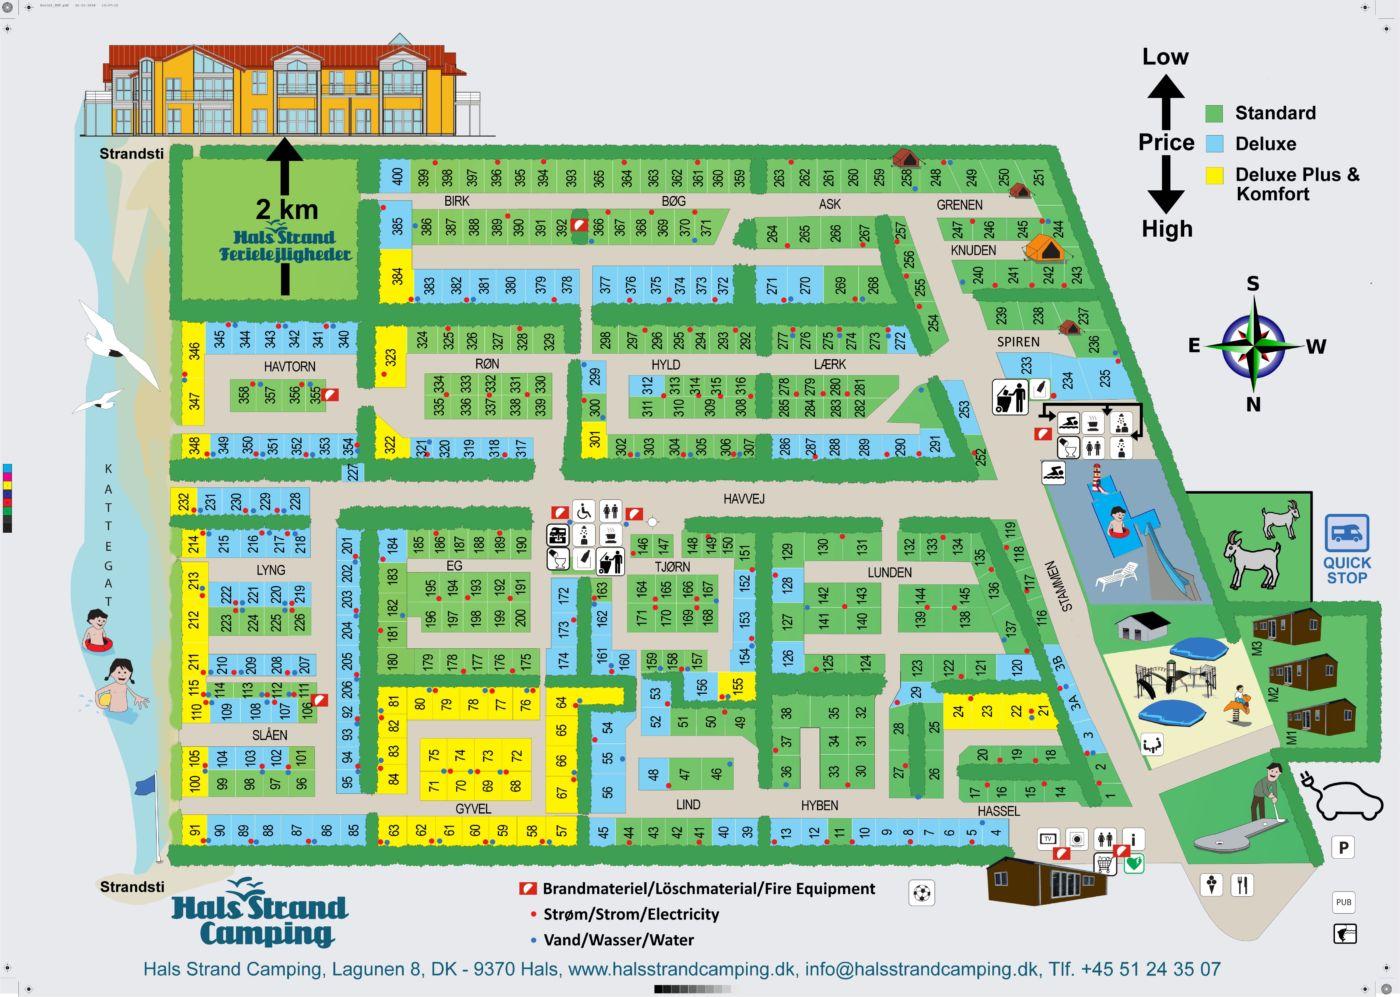 Kort over pladsen Hals Strand Camping 2020